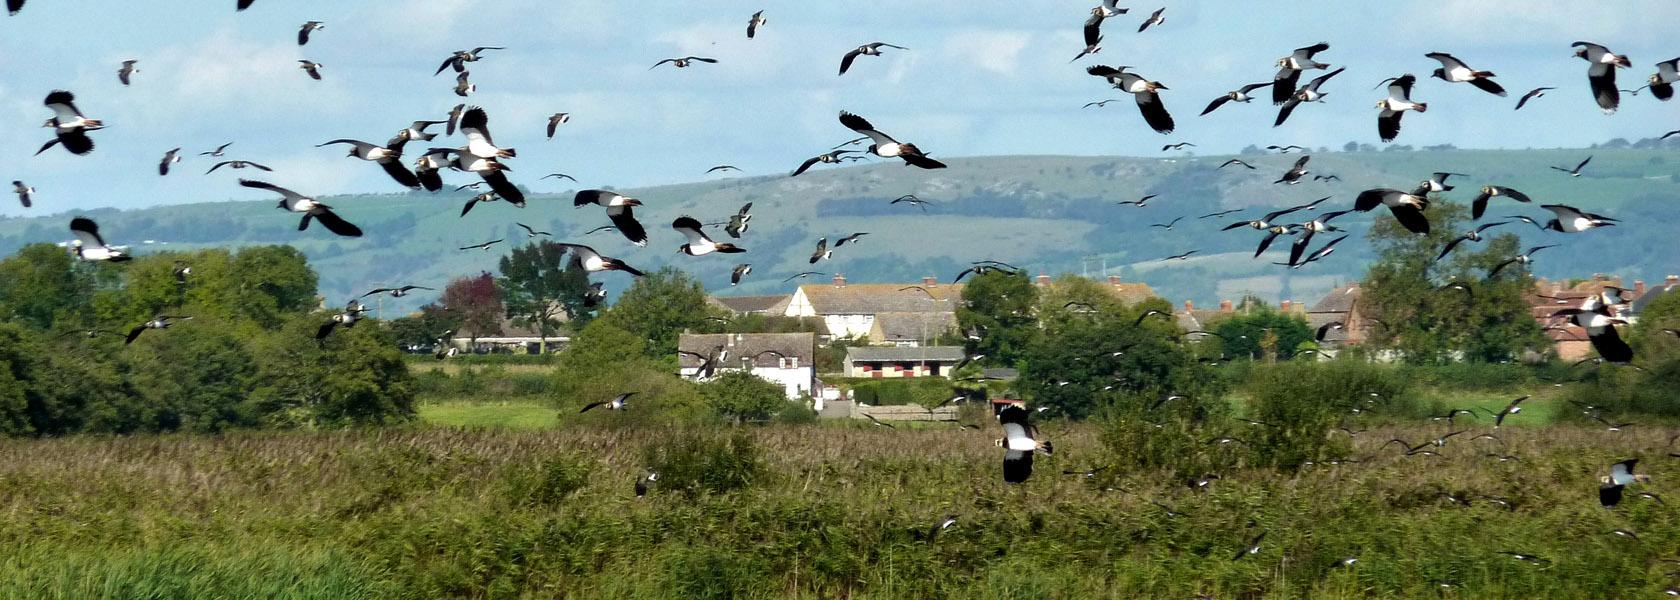 Birdwatching2_1680px